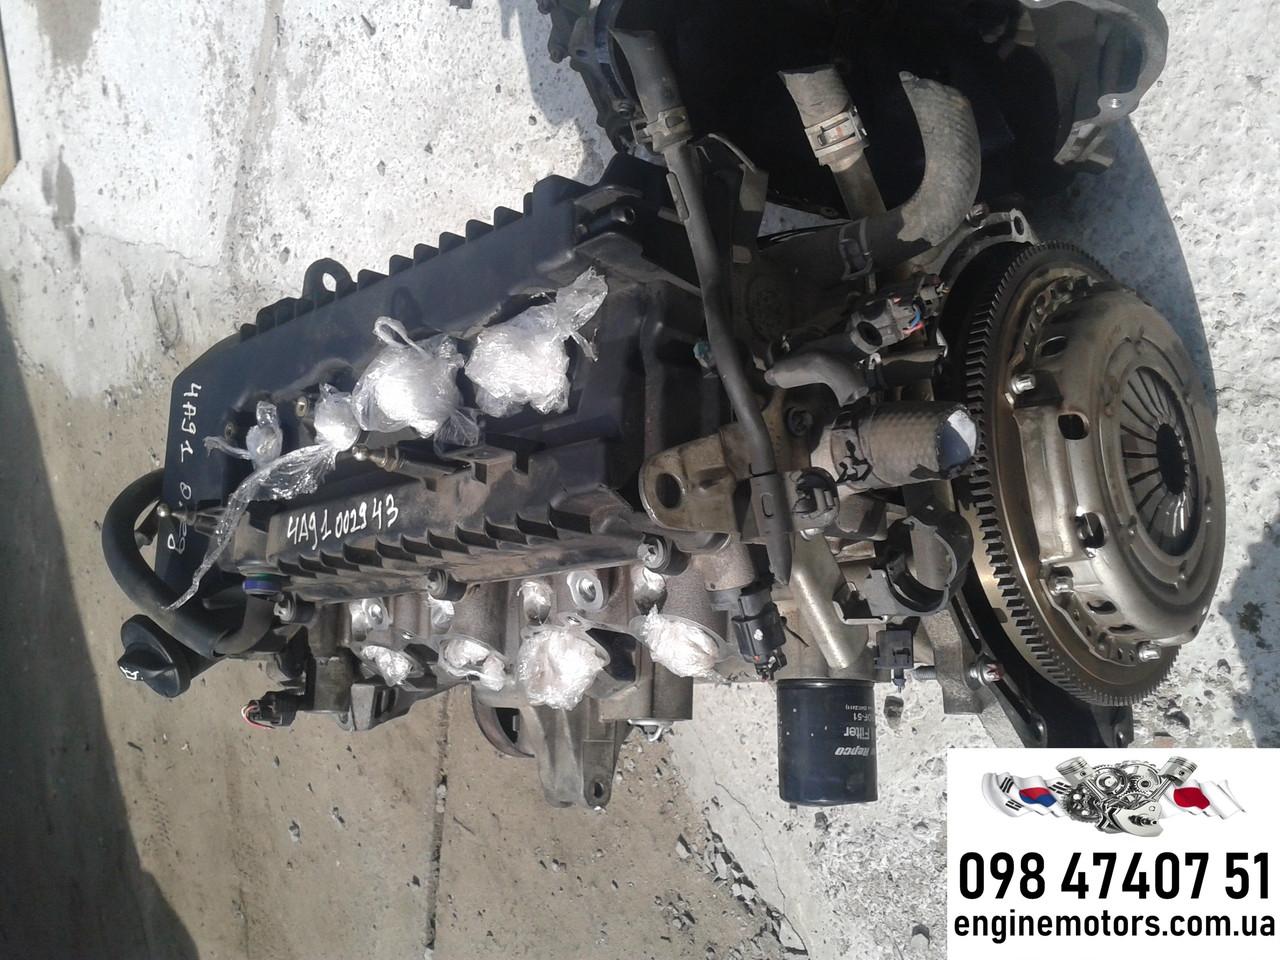 Двигатель 4A91 Lancer X Mitsubishi Colt 1.5 MN131520 MN195773 MN195783